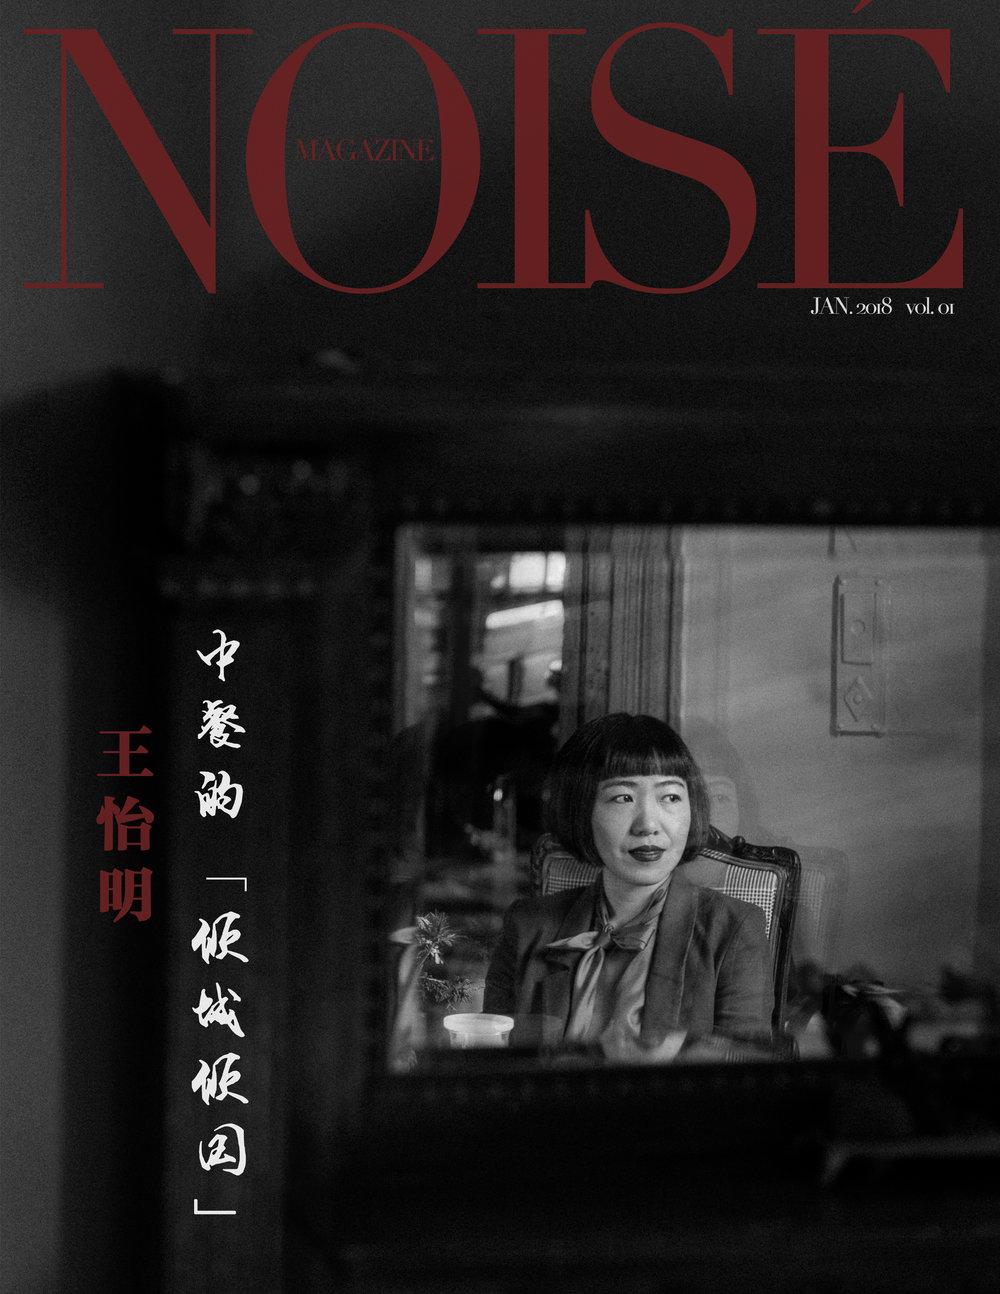 vol1王怡明cover.jpg